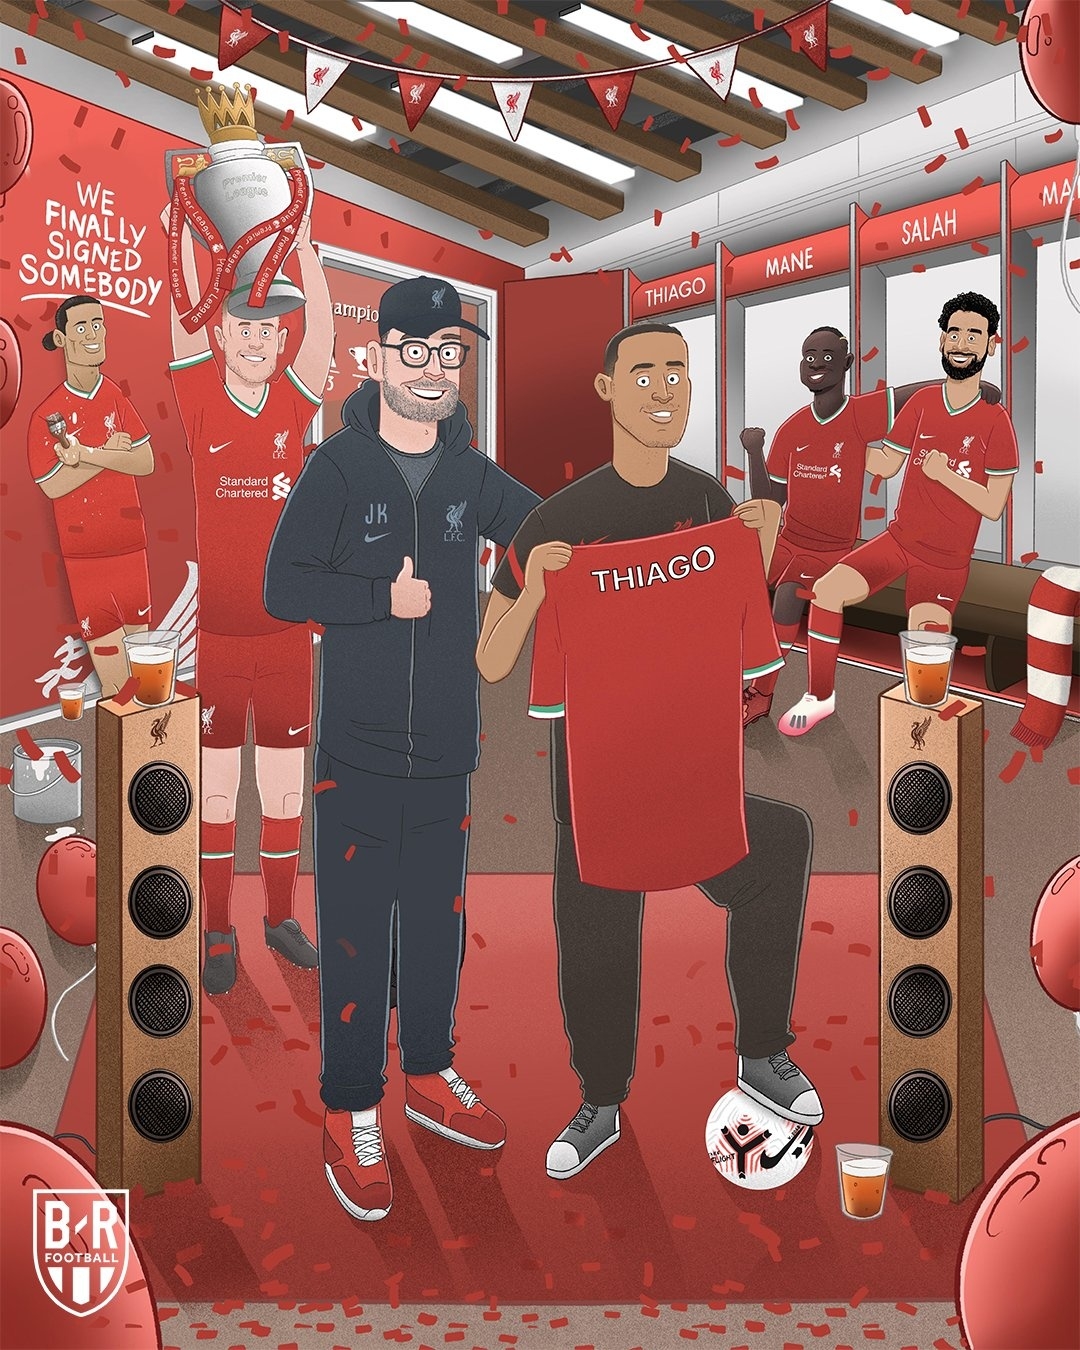 Thiago,  Liverpool,  Premier League,  Juergen Klopp,  Champions League,  Bayern,  Man United,  Chelsea,  Arsenal,  Barca anh 5